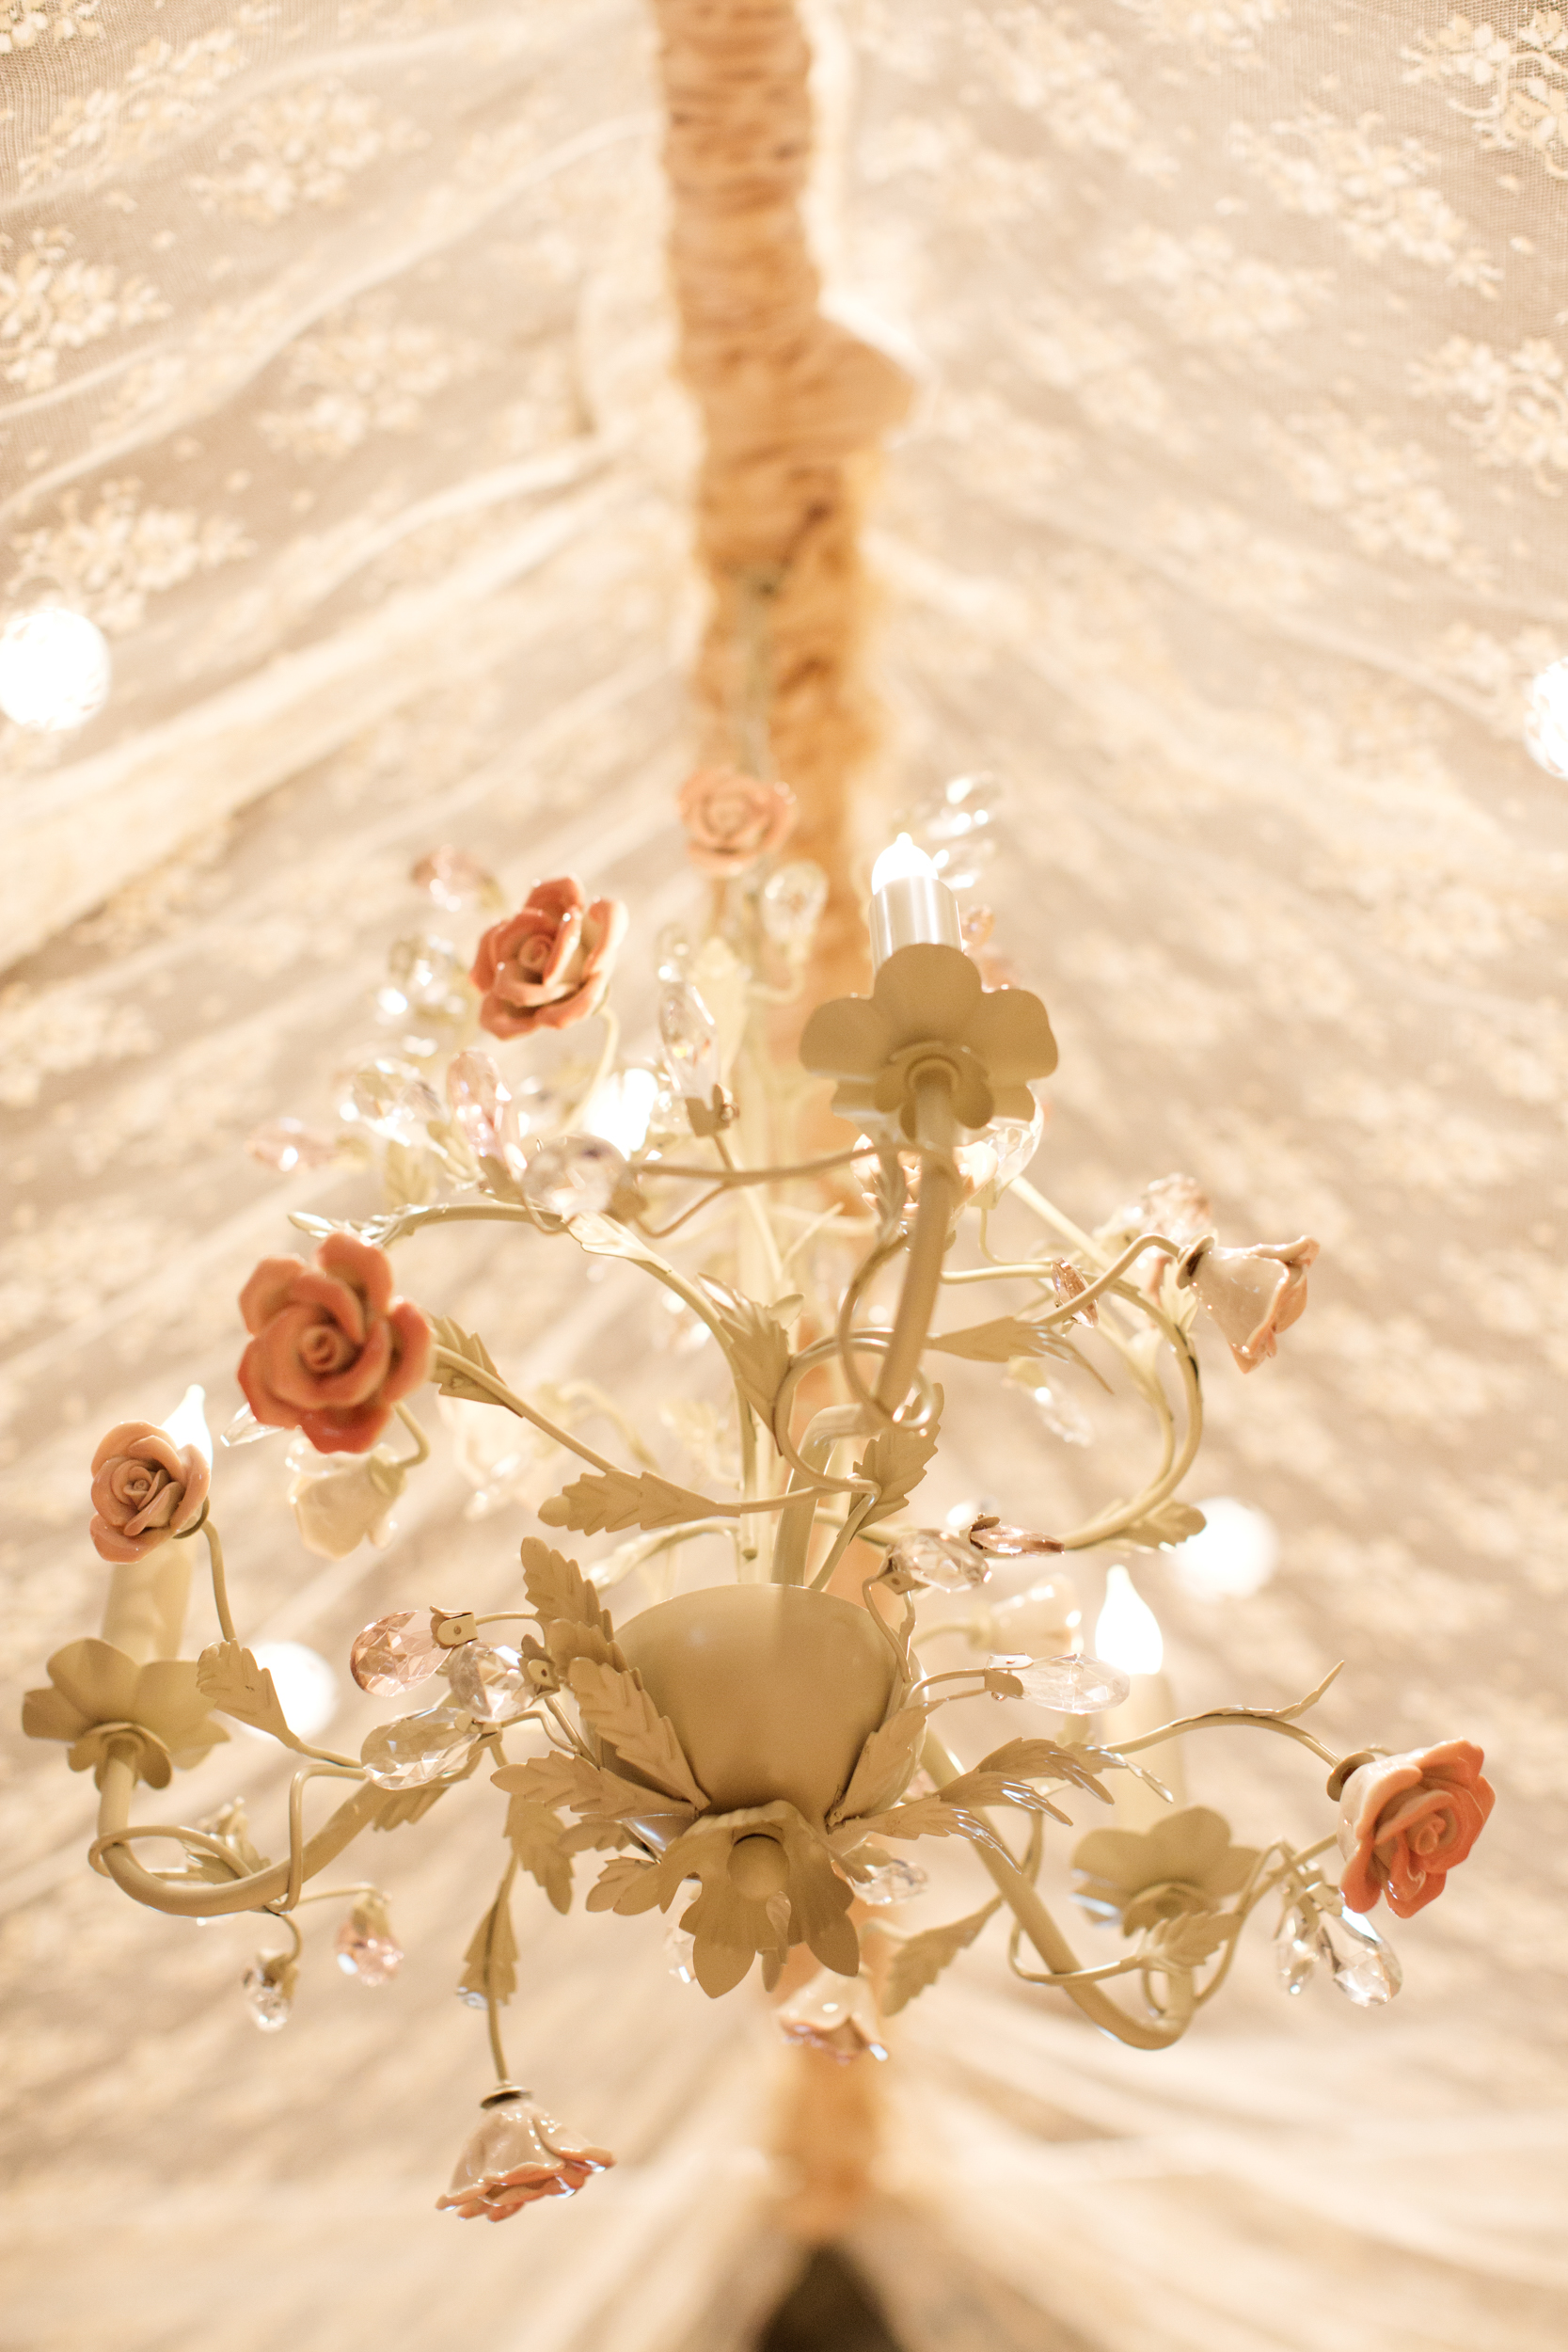 Ceci_New_York_Ceci_Style_Ceci_Johnson_Luxury_Lifestyle_Floral_Lace_Wedding_Letterpress_Inspiration_Design_Custom_Couture_Personalized_Invitations_-46.jpg